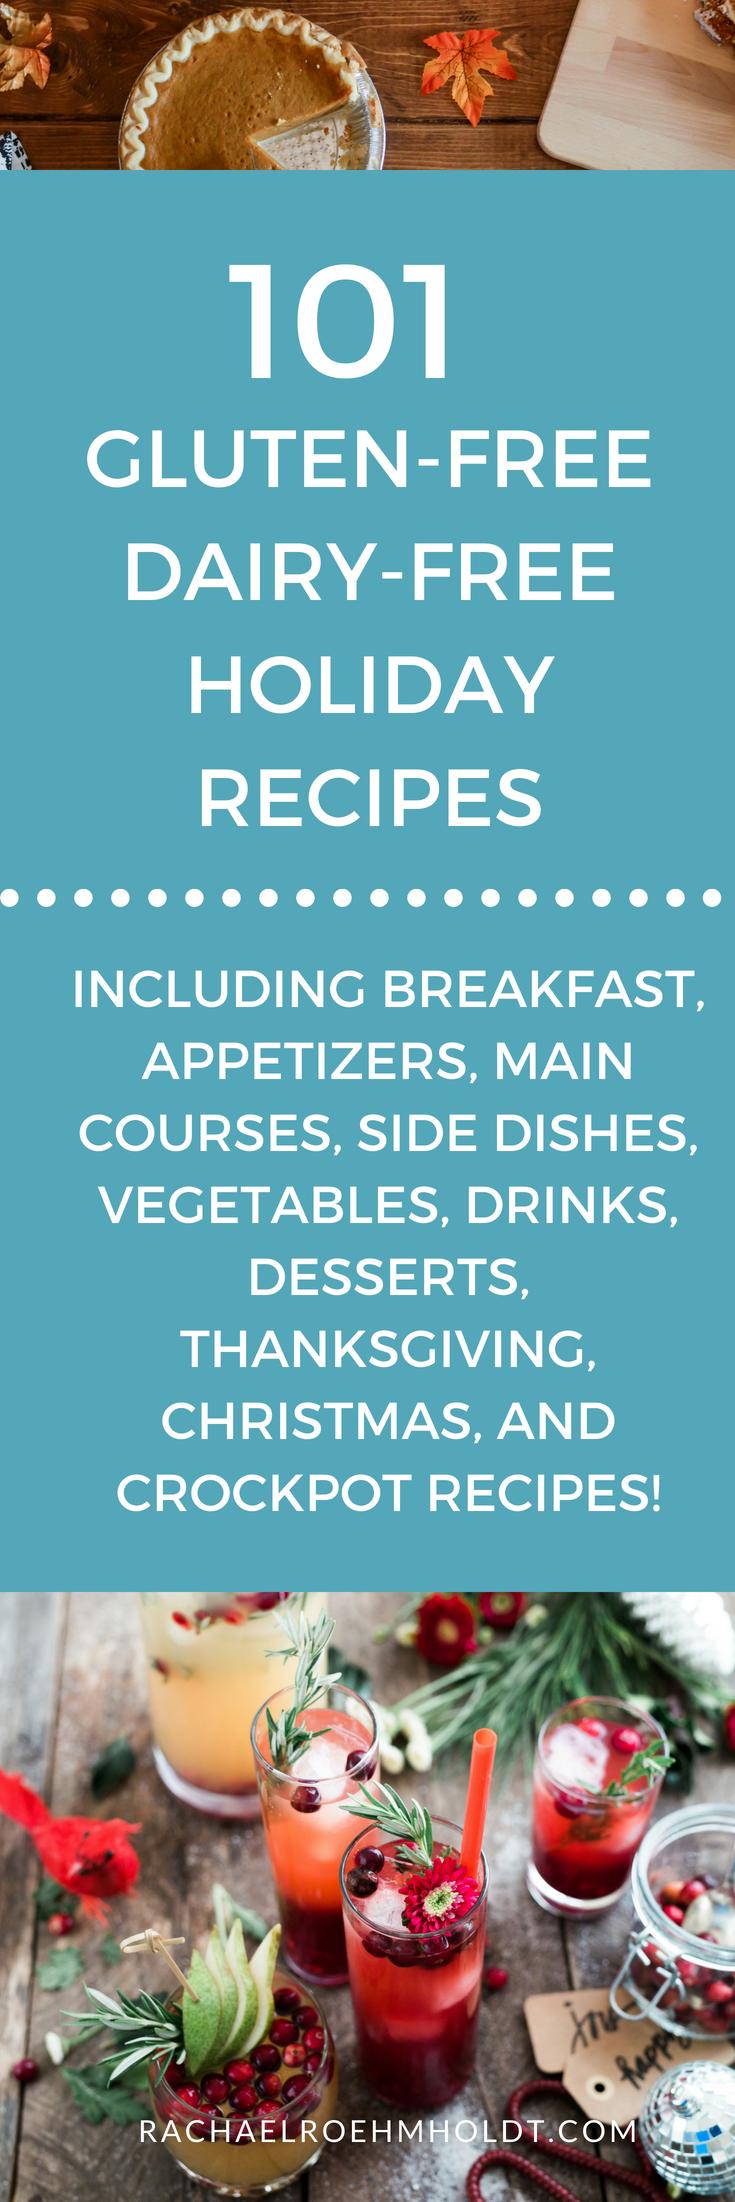 101 Holiday Gluten-free Dairy-free Recipes